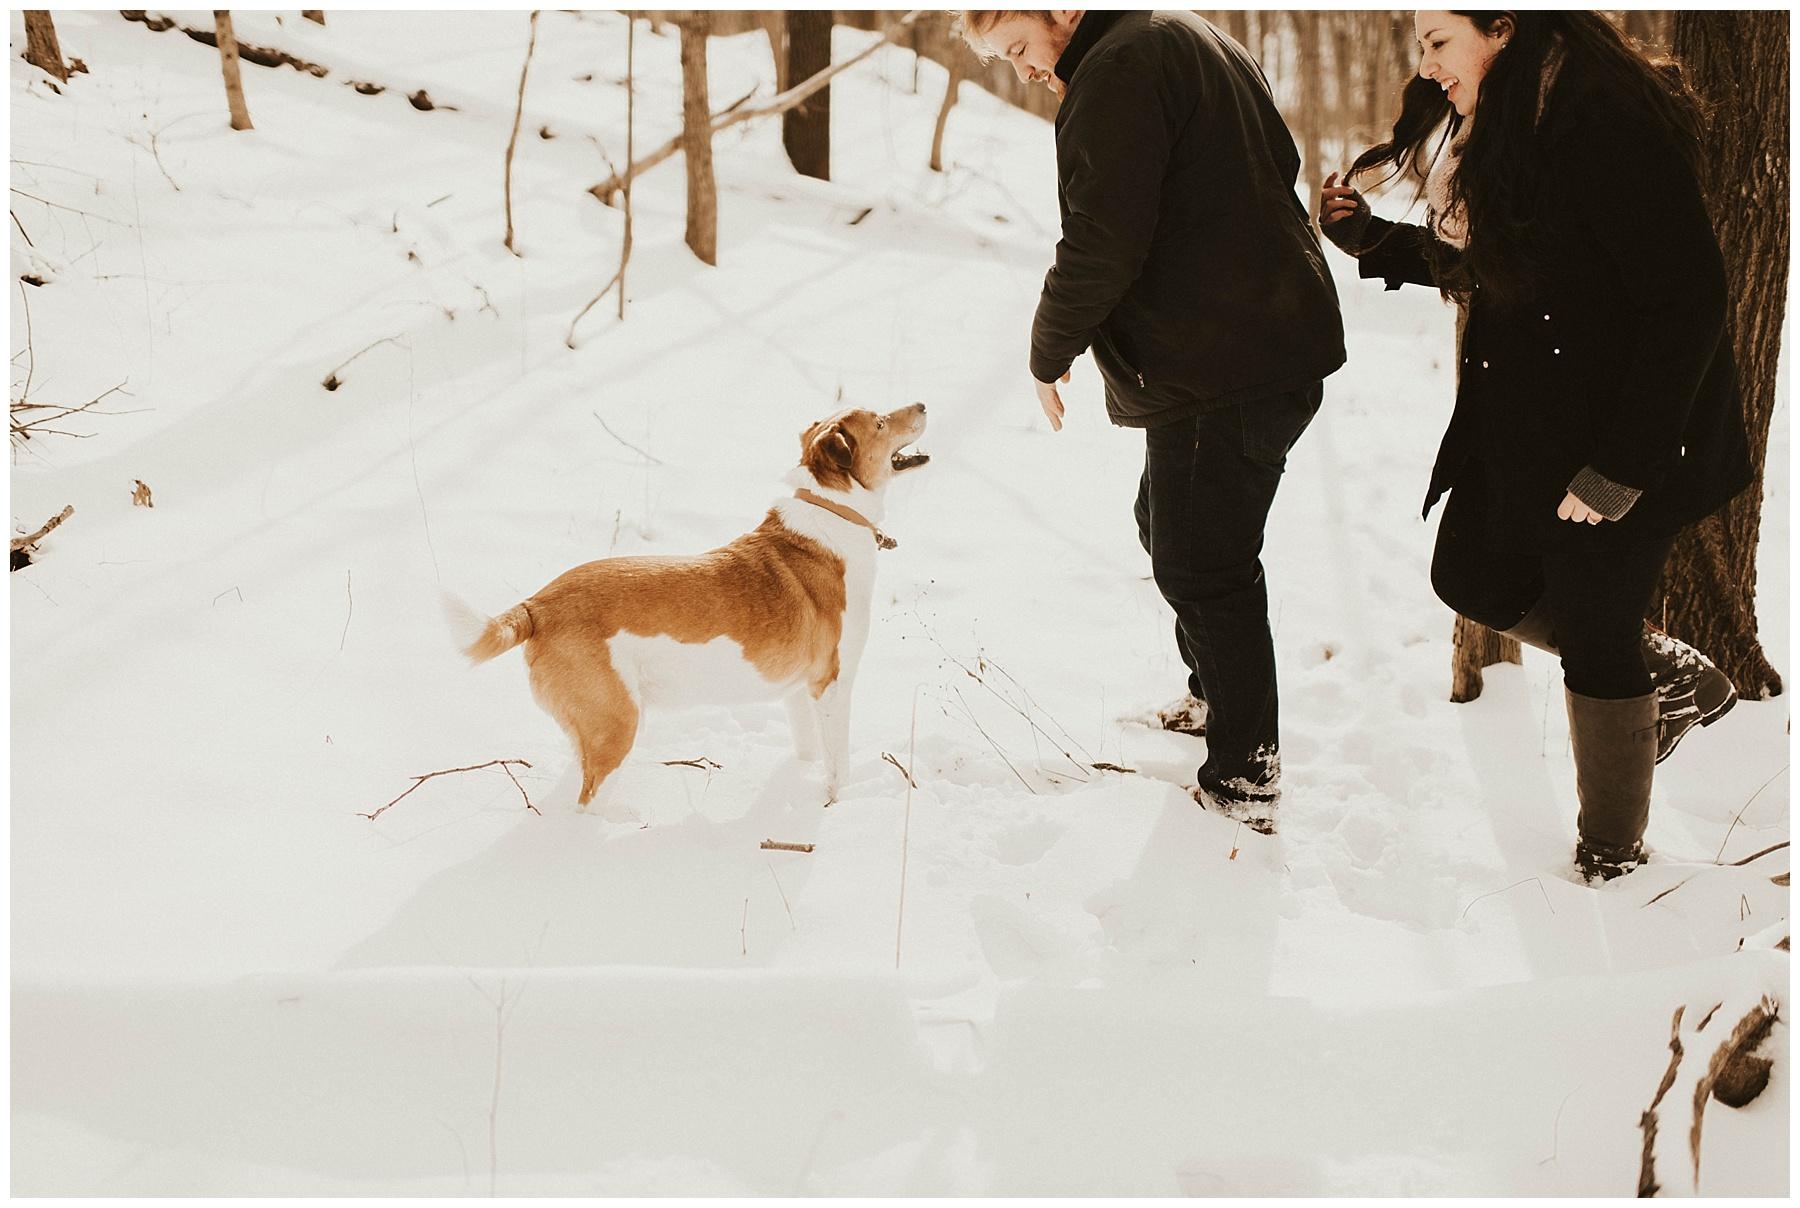 ced76cae3 Ben + Lainee    Winter Engagements - Lauren F.otography